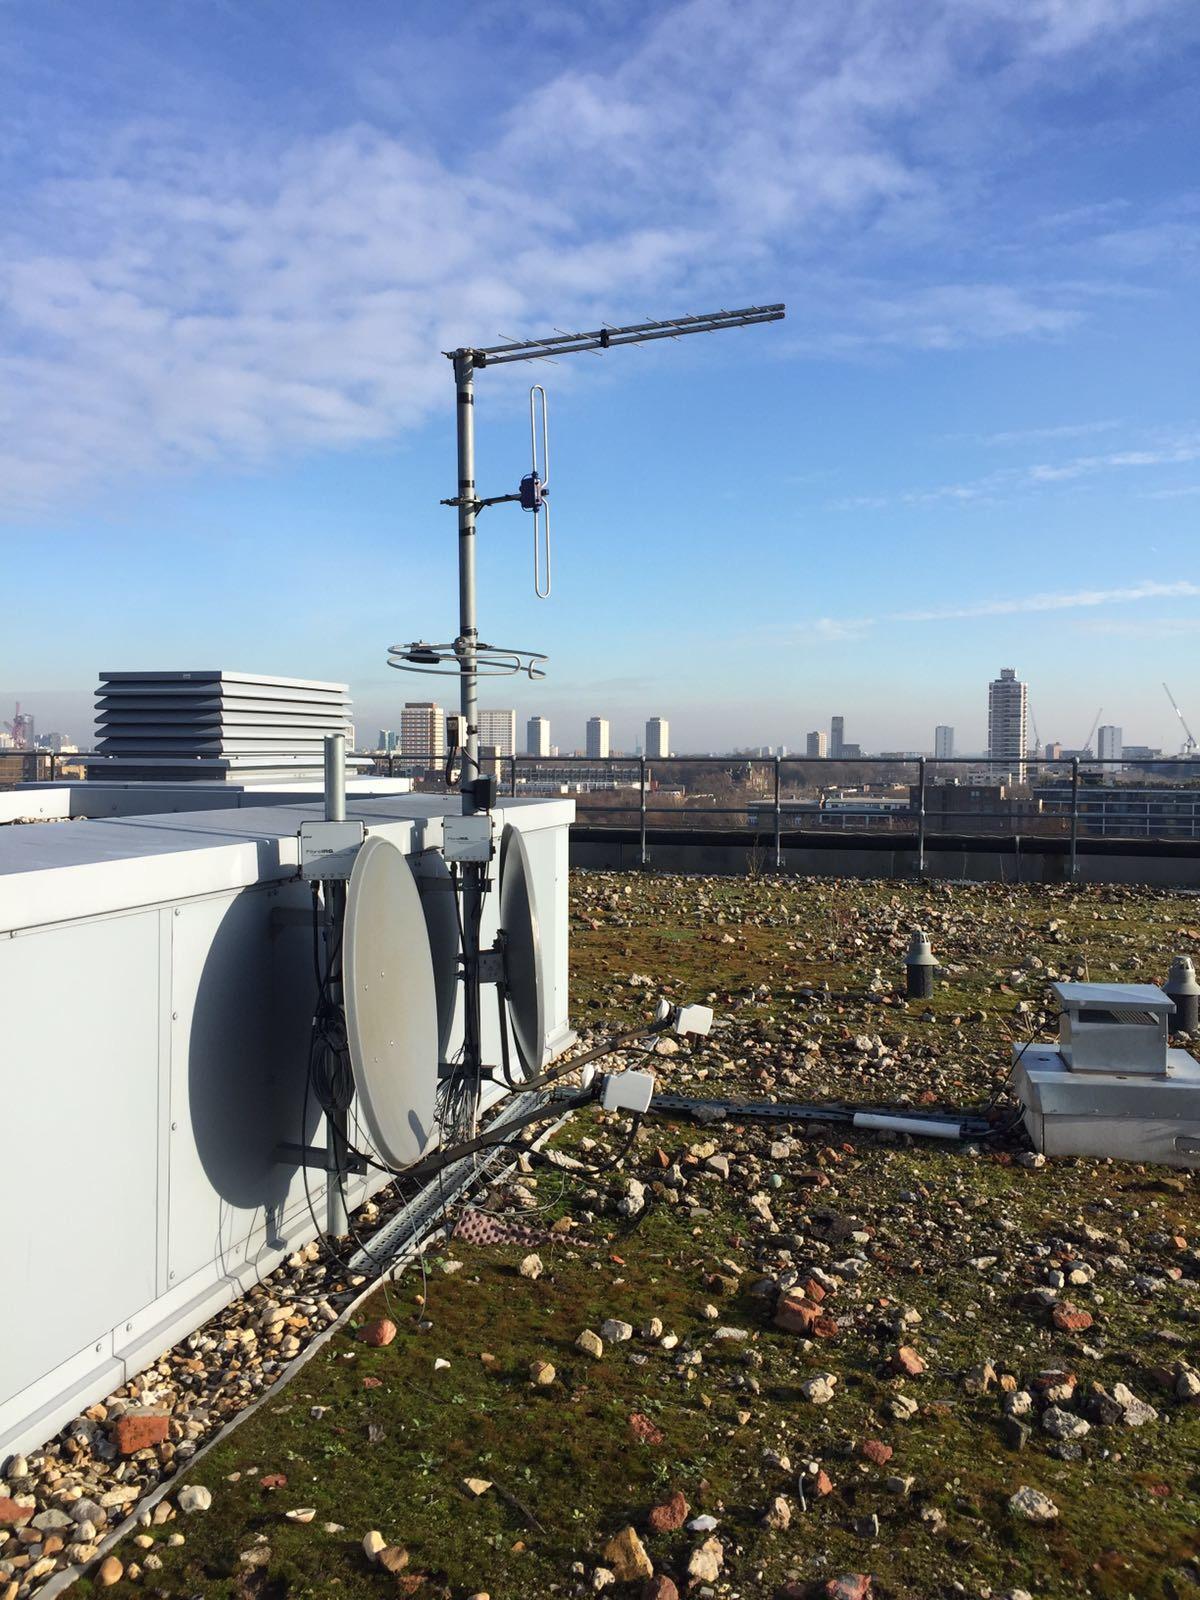 irs-system-install-satellite-aerial